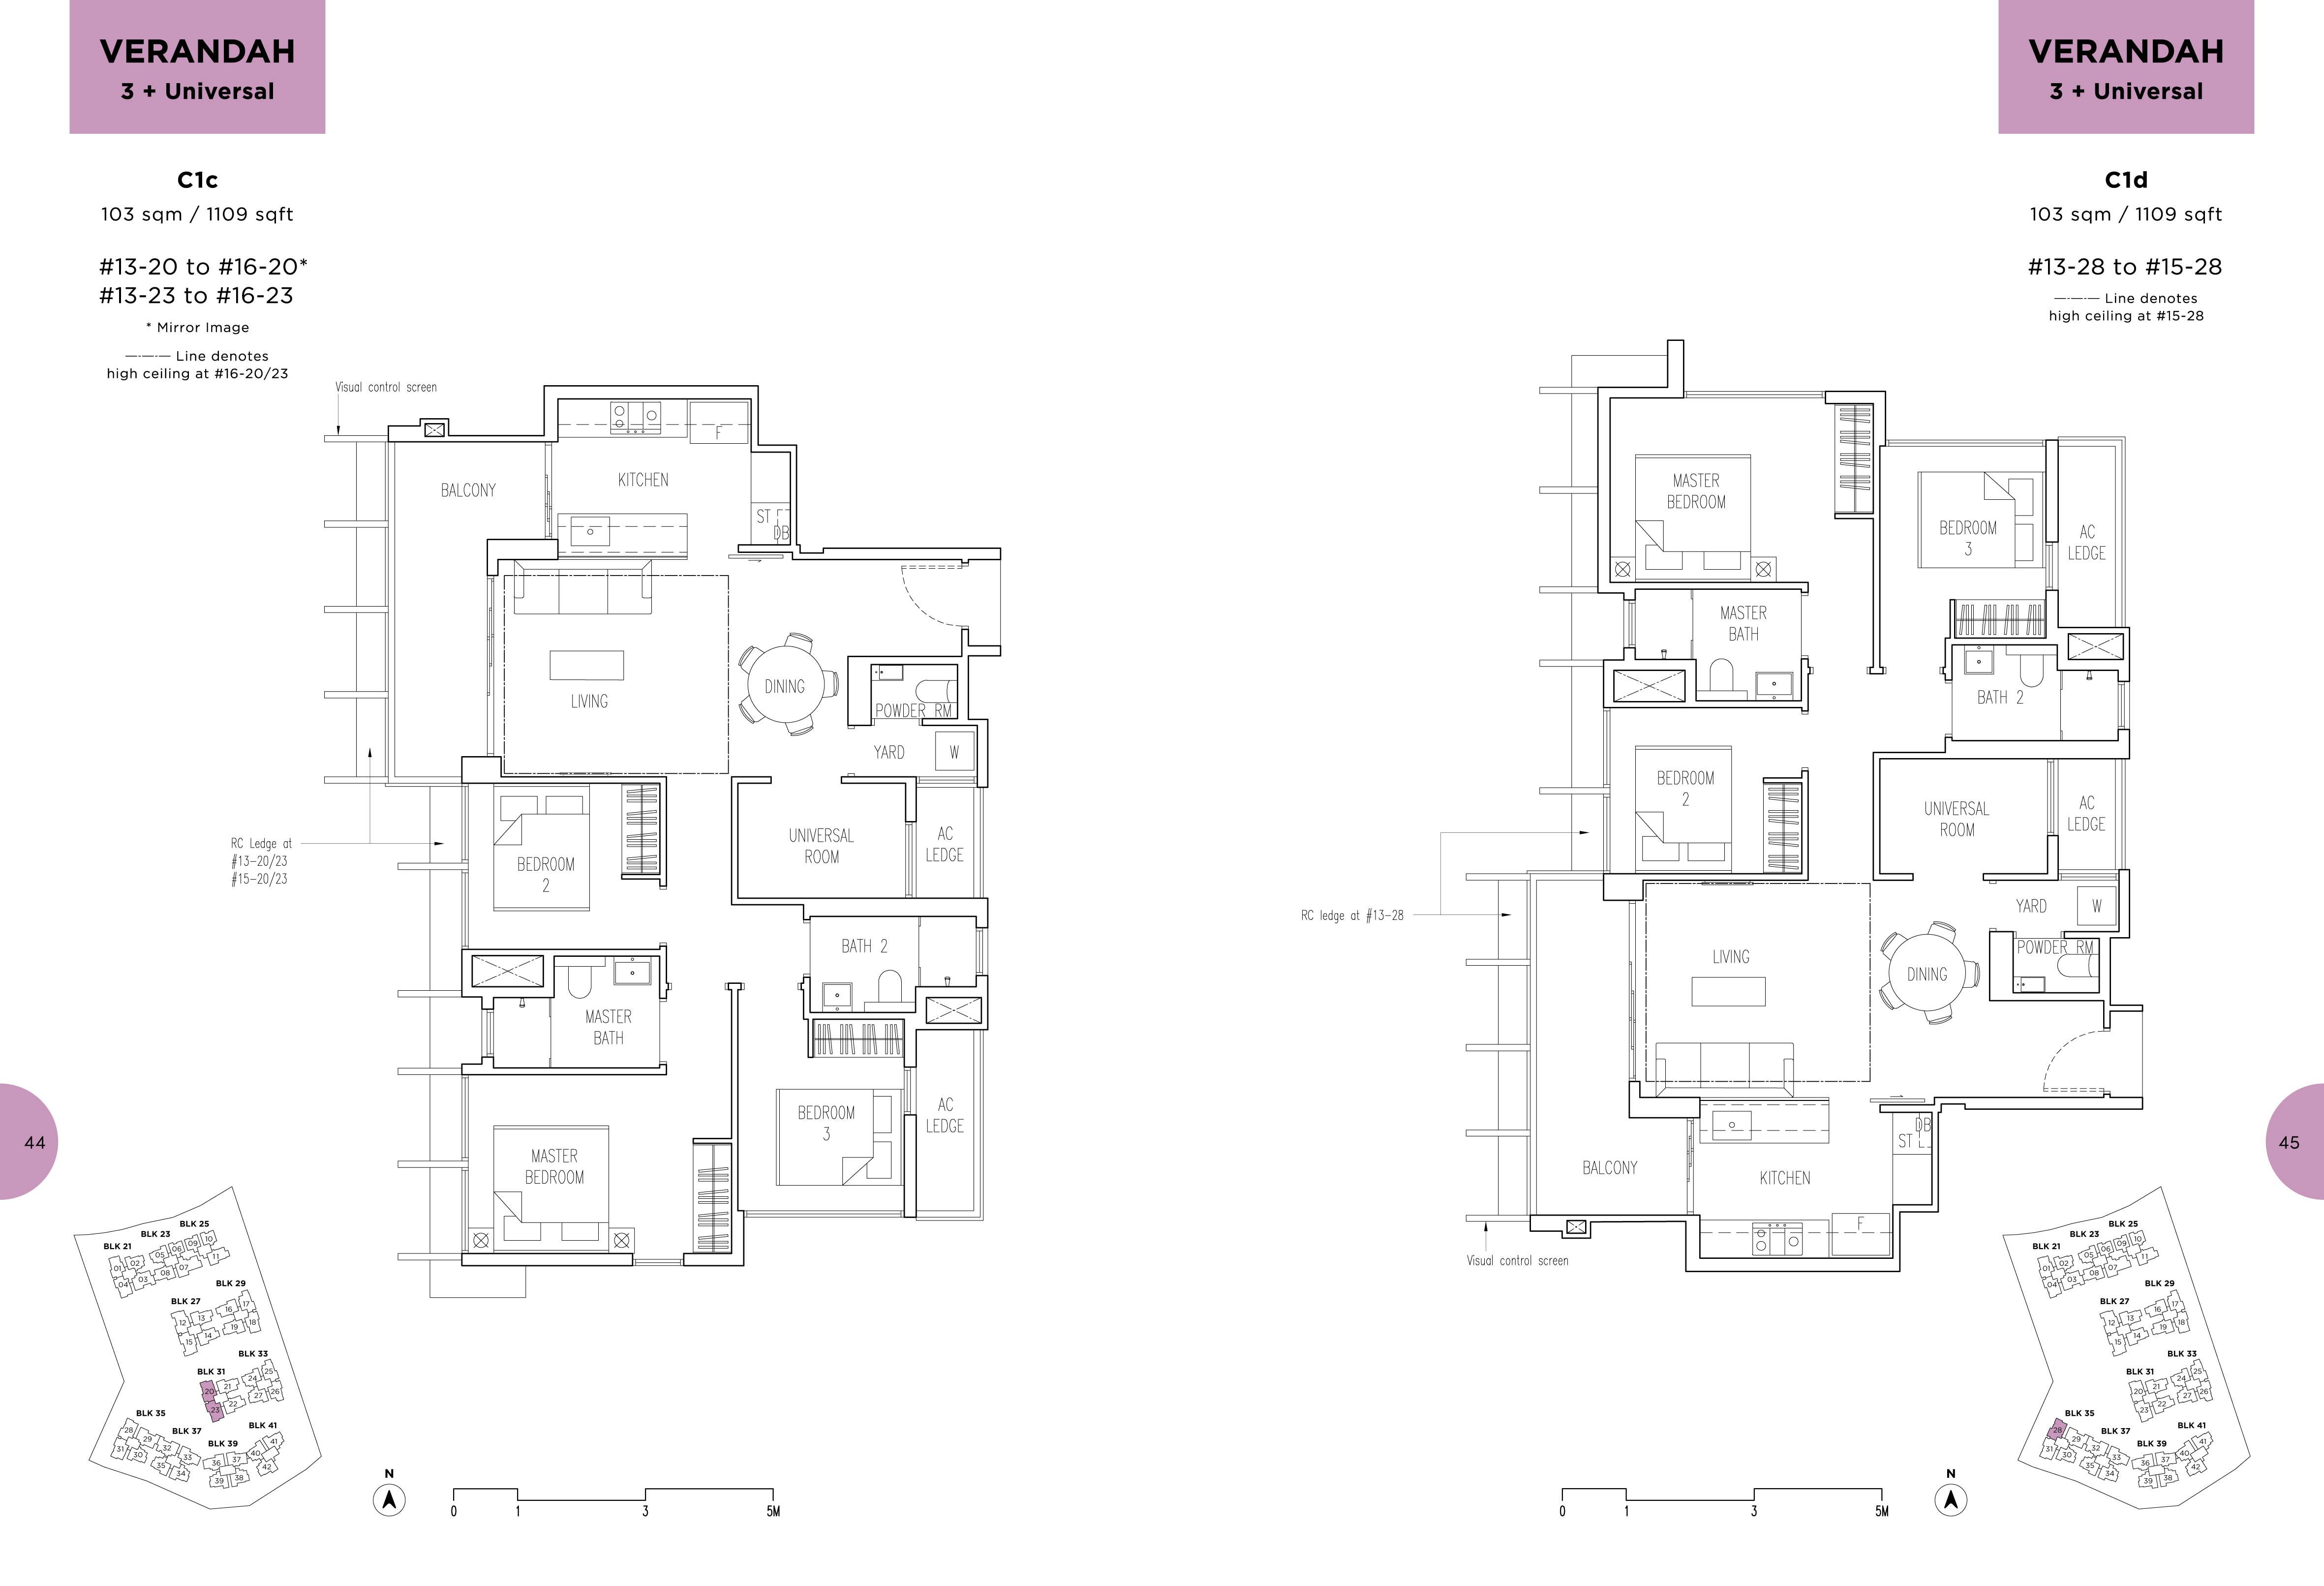 verandah_Floorplan-7